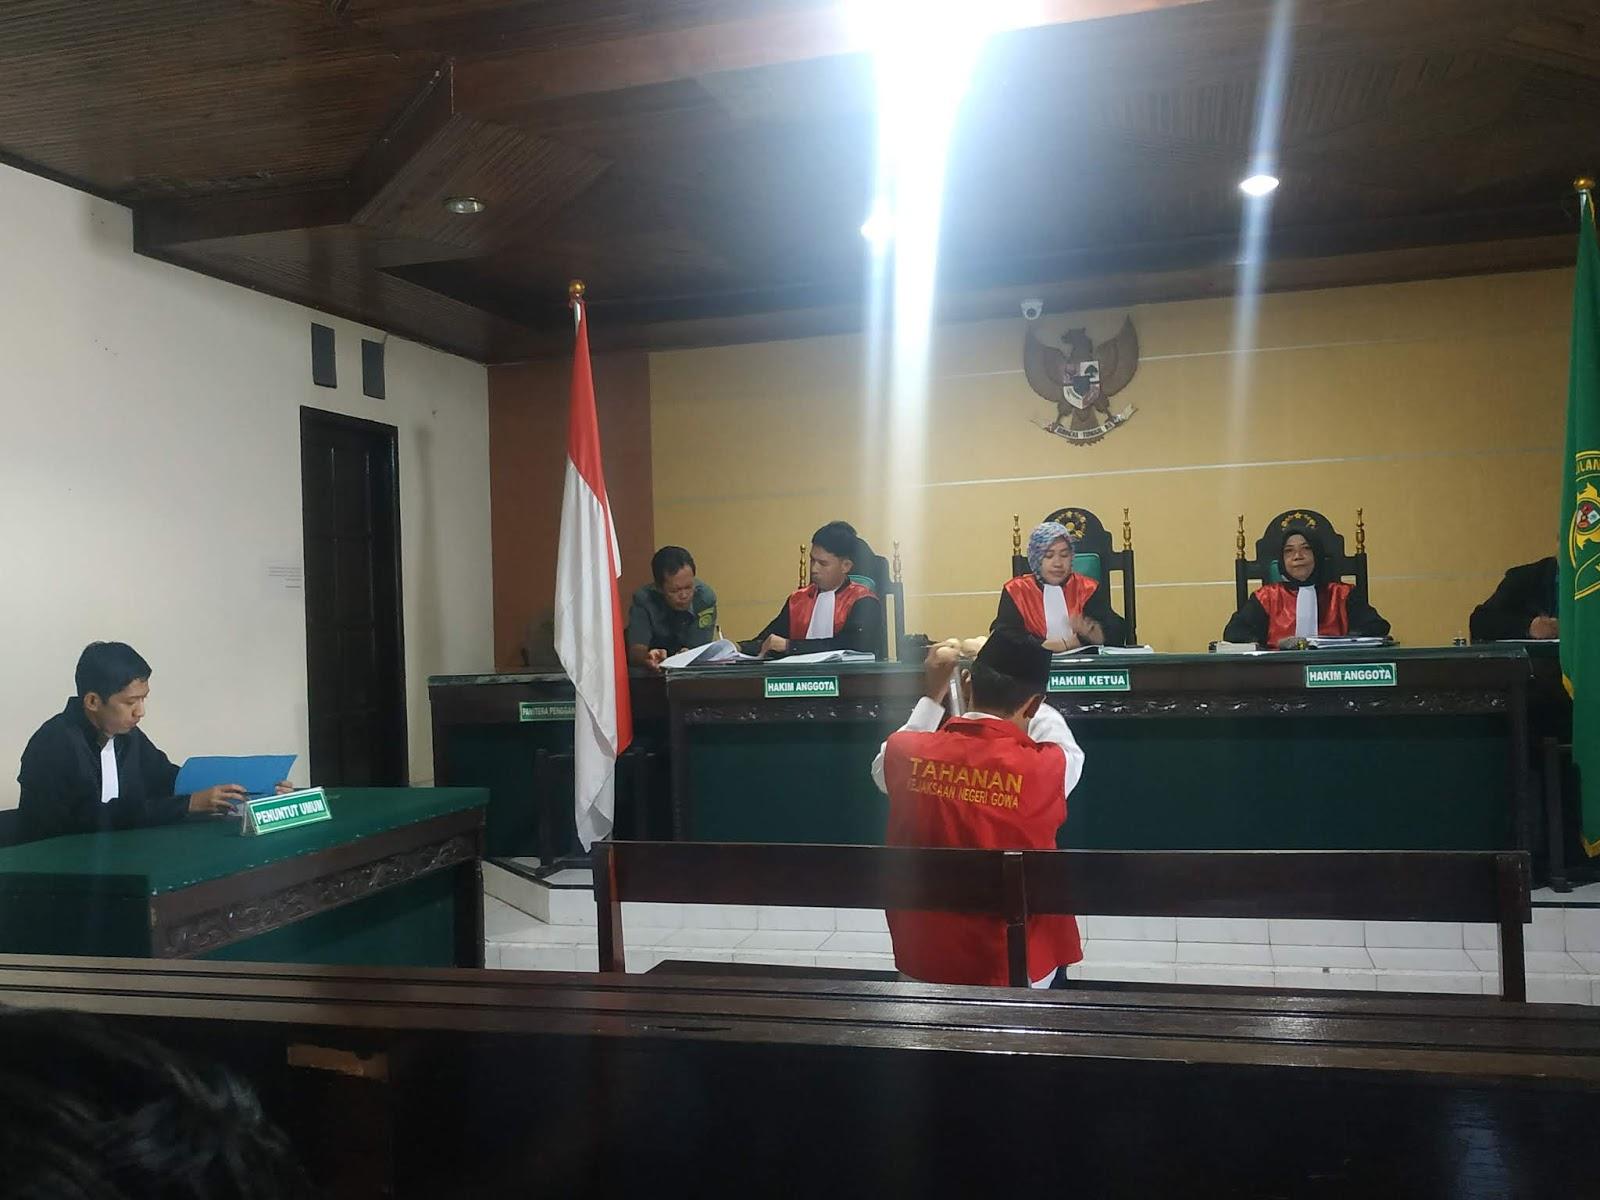 PN Sungguminasa Gowa Vonis AM Riskan 1 Tahun 6 Bulan dan Denda Rp 10 Juta